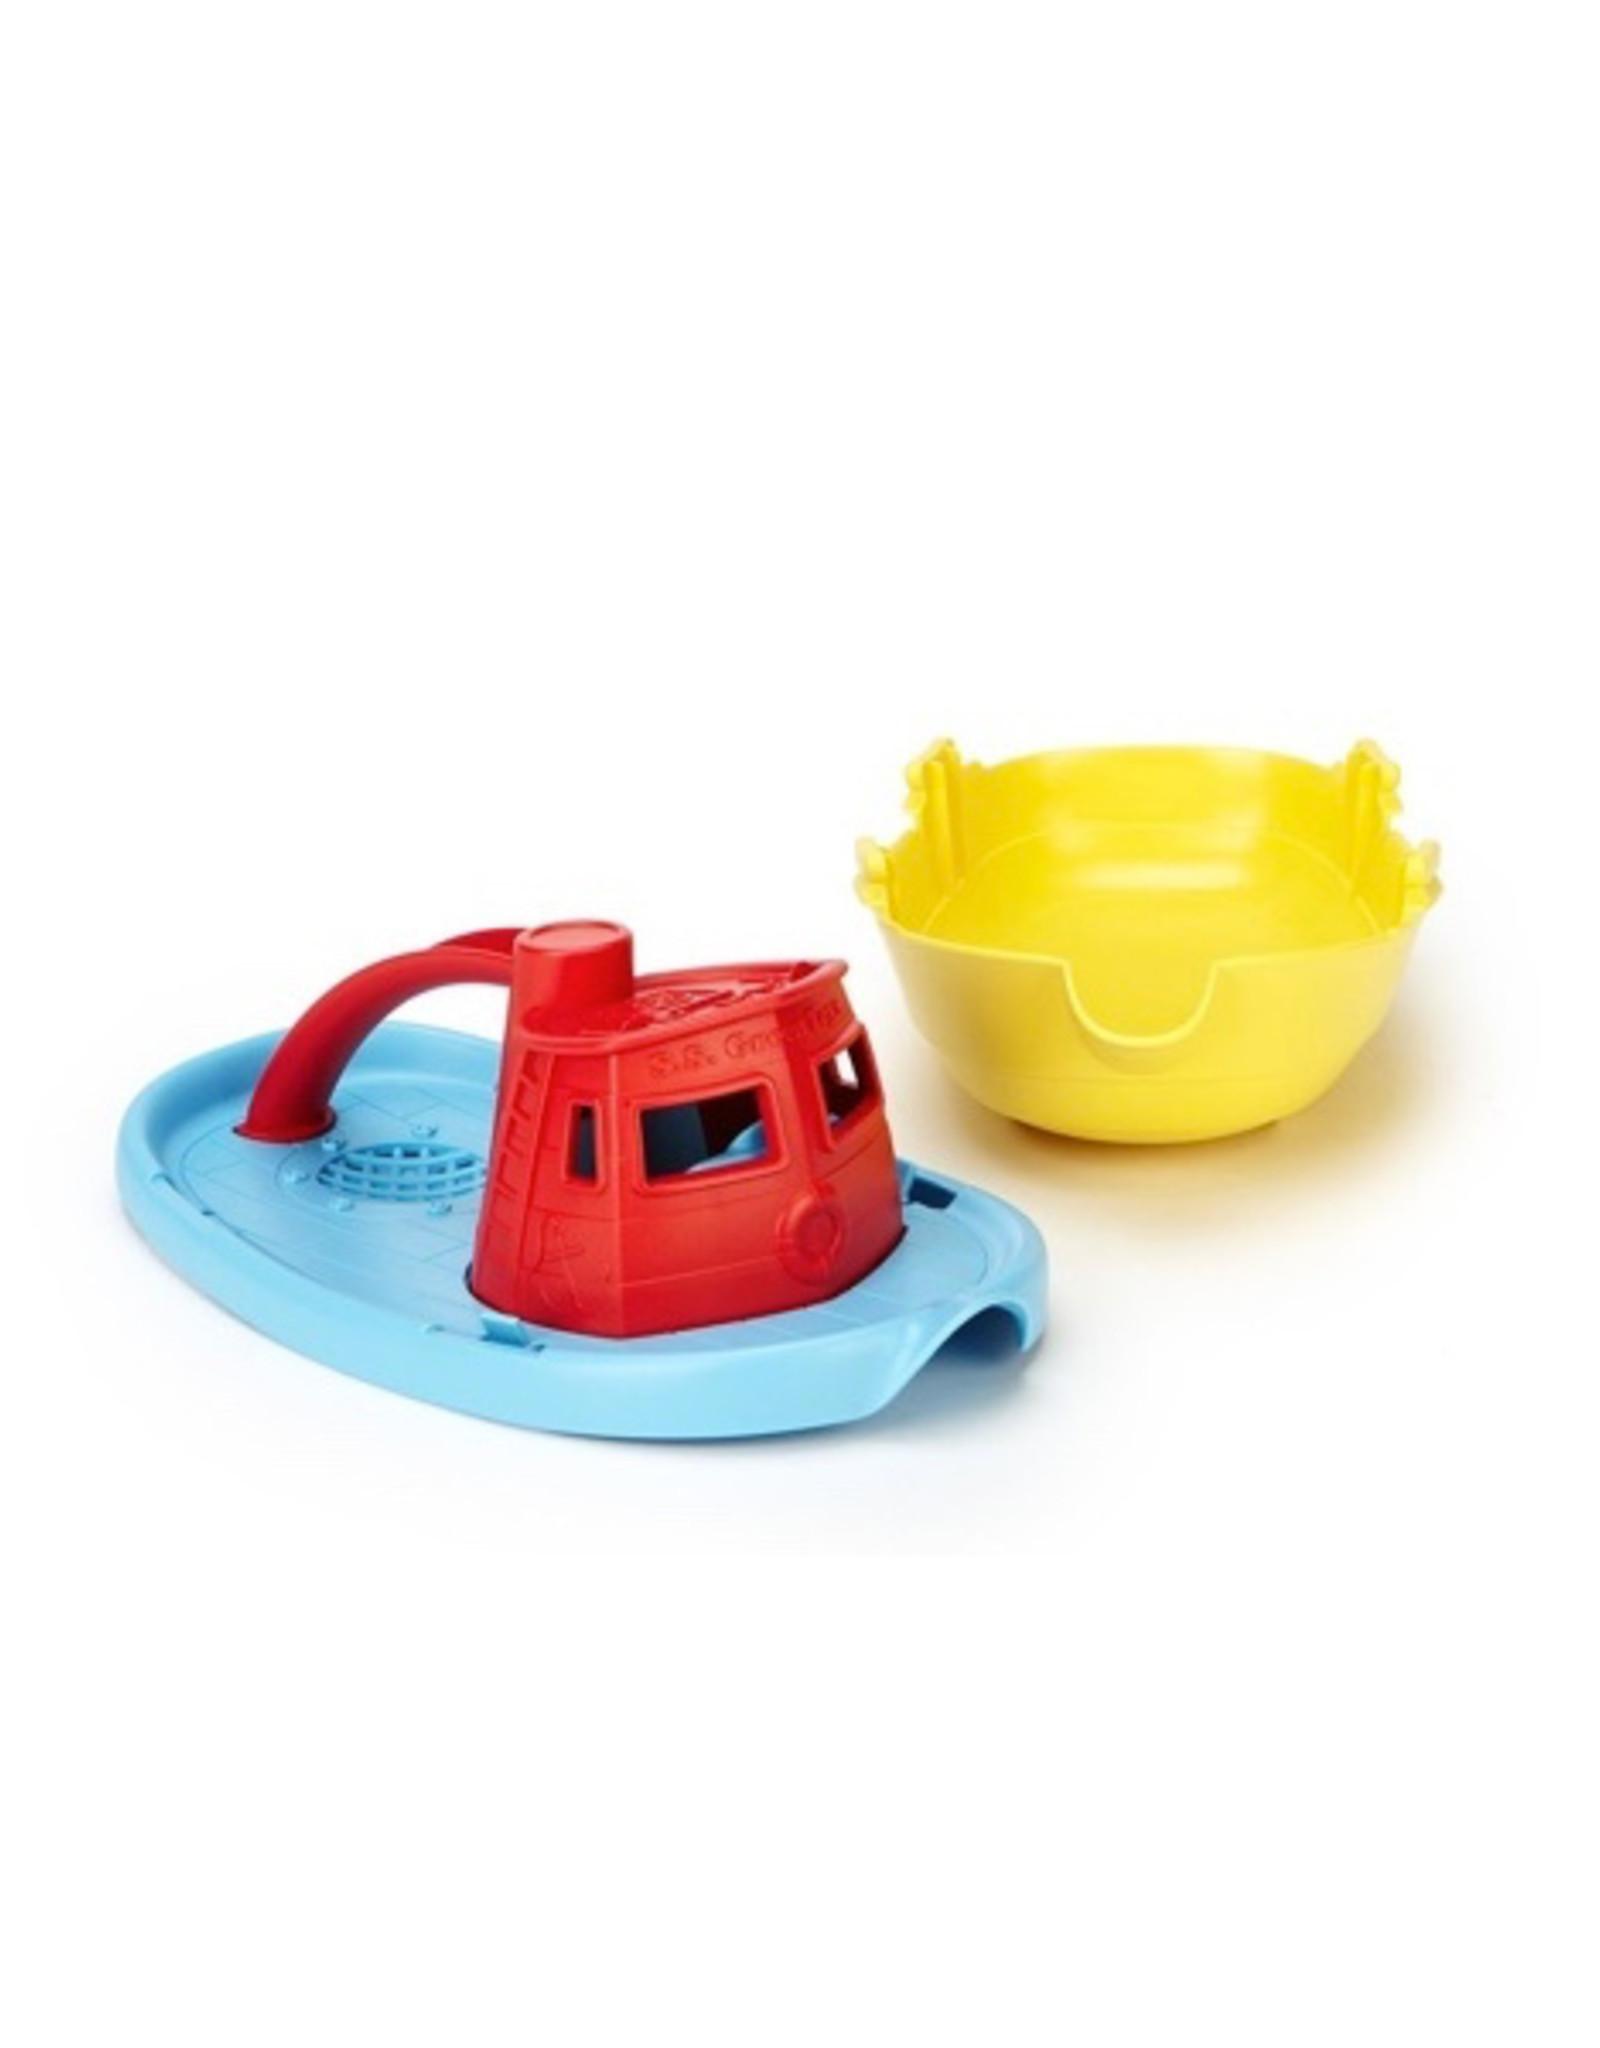 Green Toys Tug Boat -